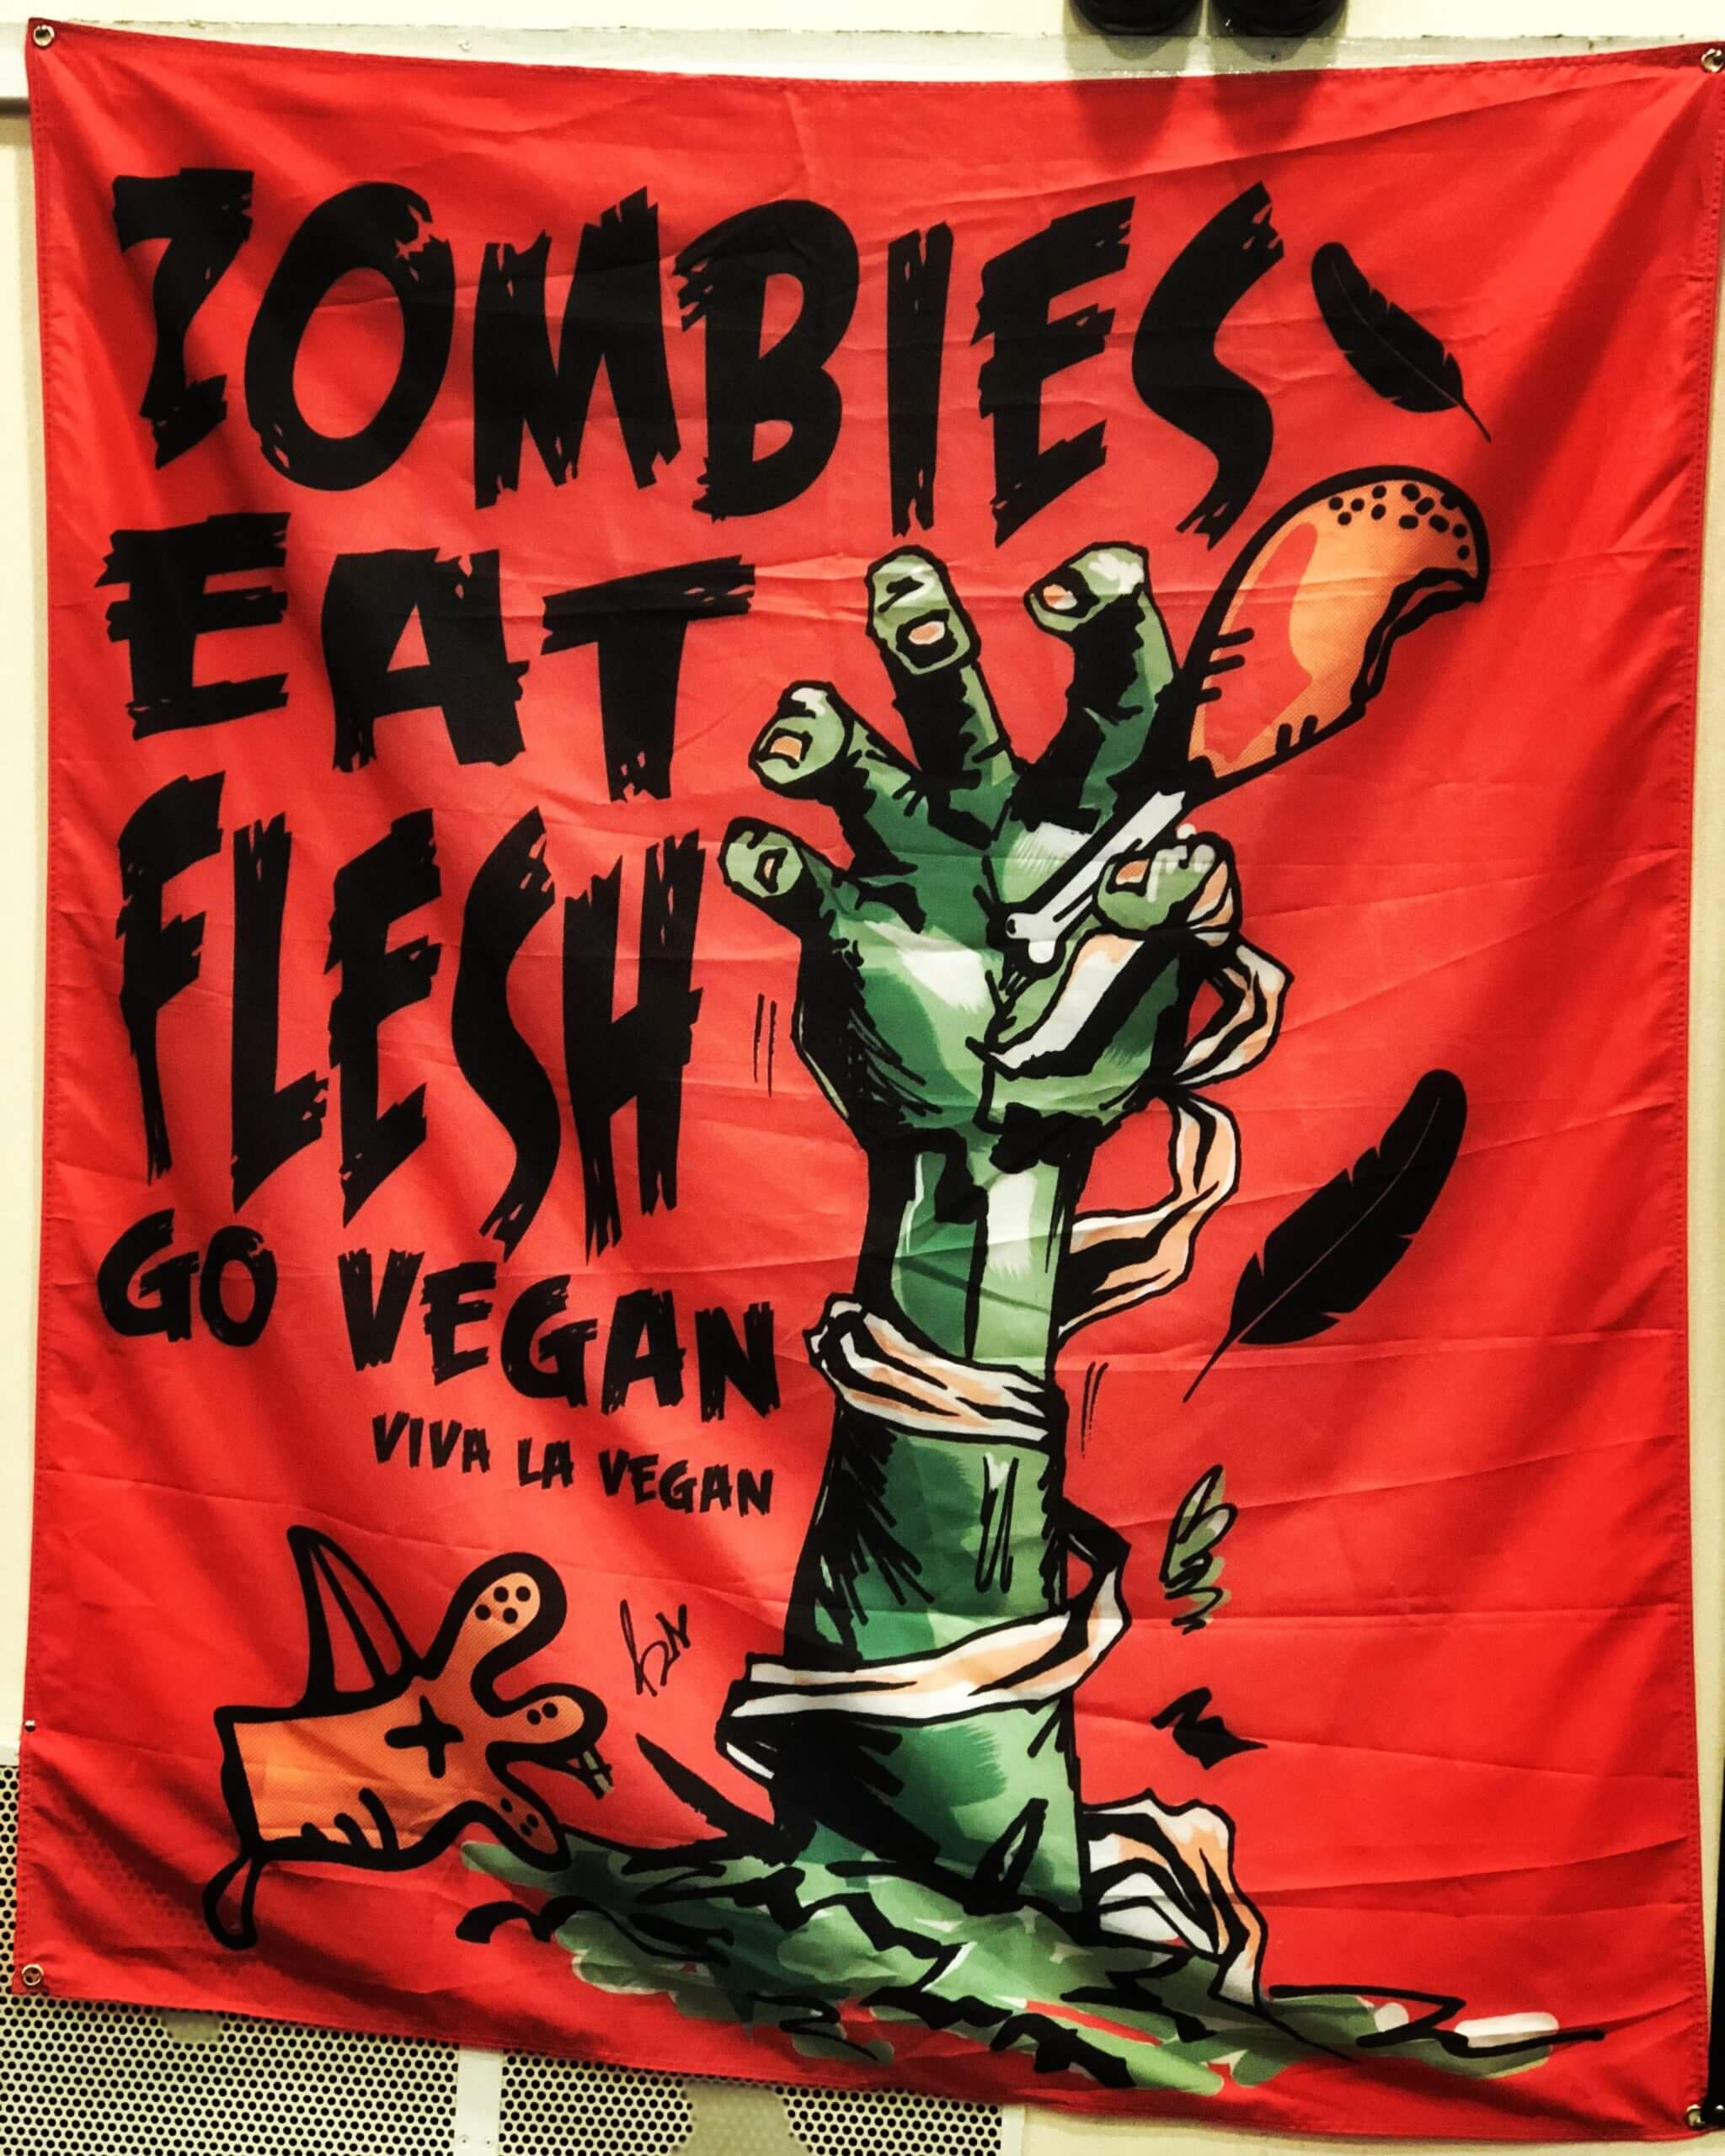 Statement Flag: Zombies Eat Flesh